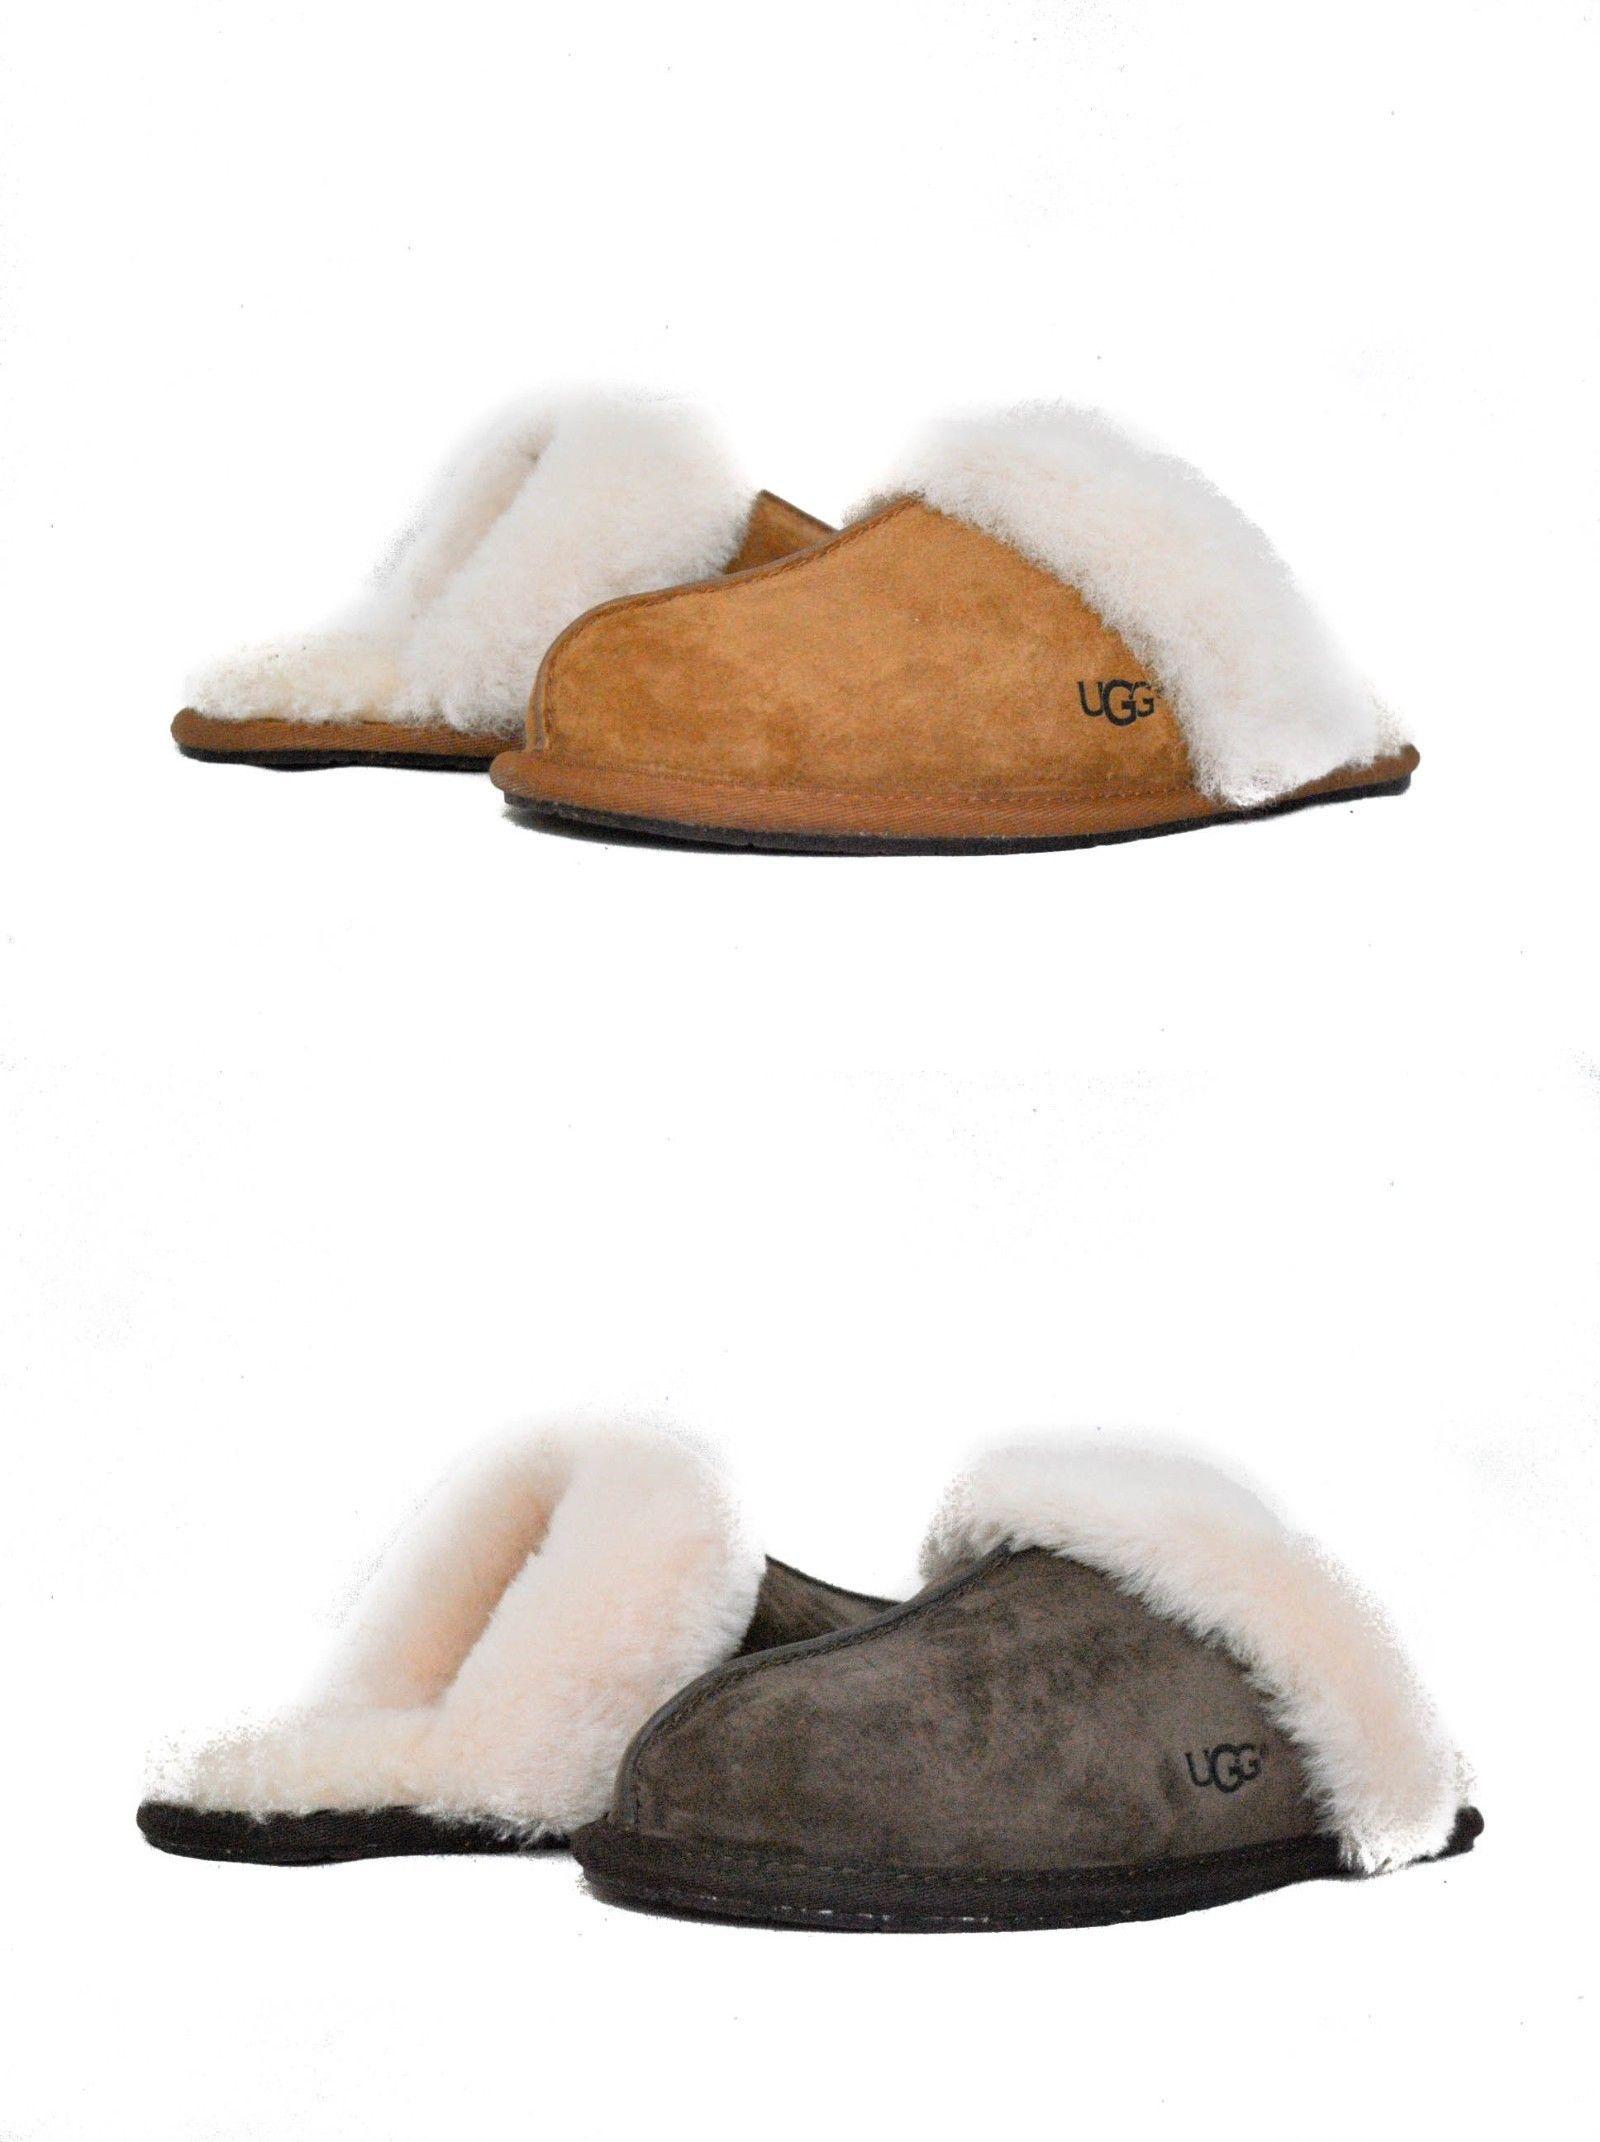 605e9e1e56b3 Slippers 11632  Ugg Australia Women S Scuffette Ii Slippers Chestnut Espresso  Suede New Sz 5-12 -  BUY IT NOW ONLY   84.99 on  eBay  slippers  australia  ...